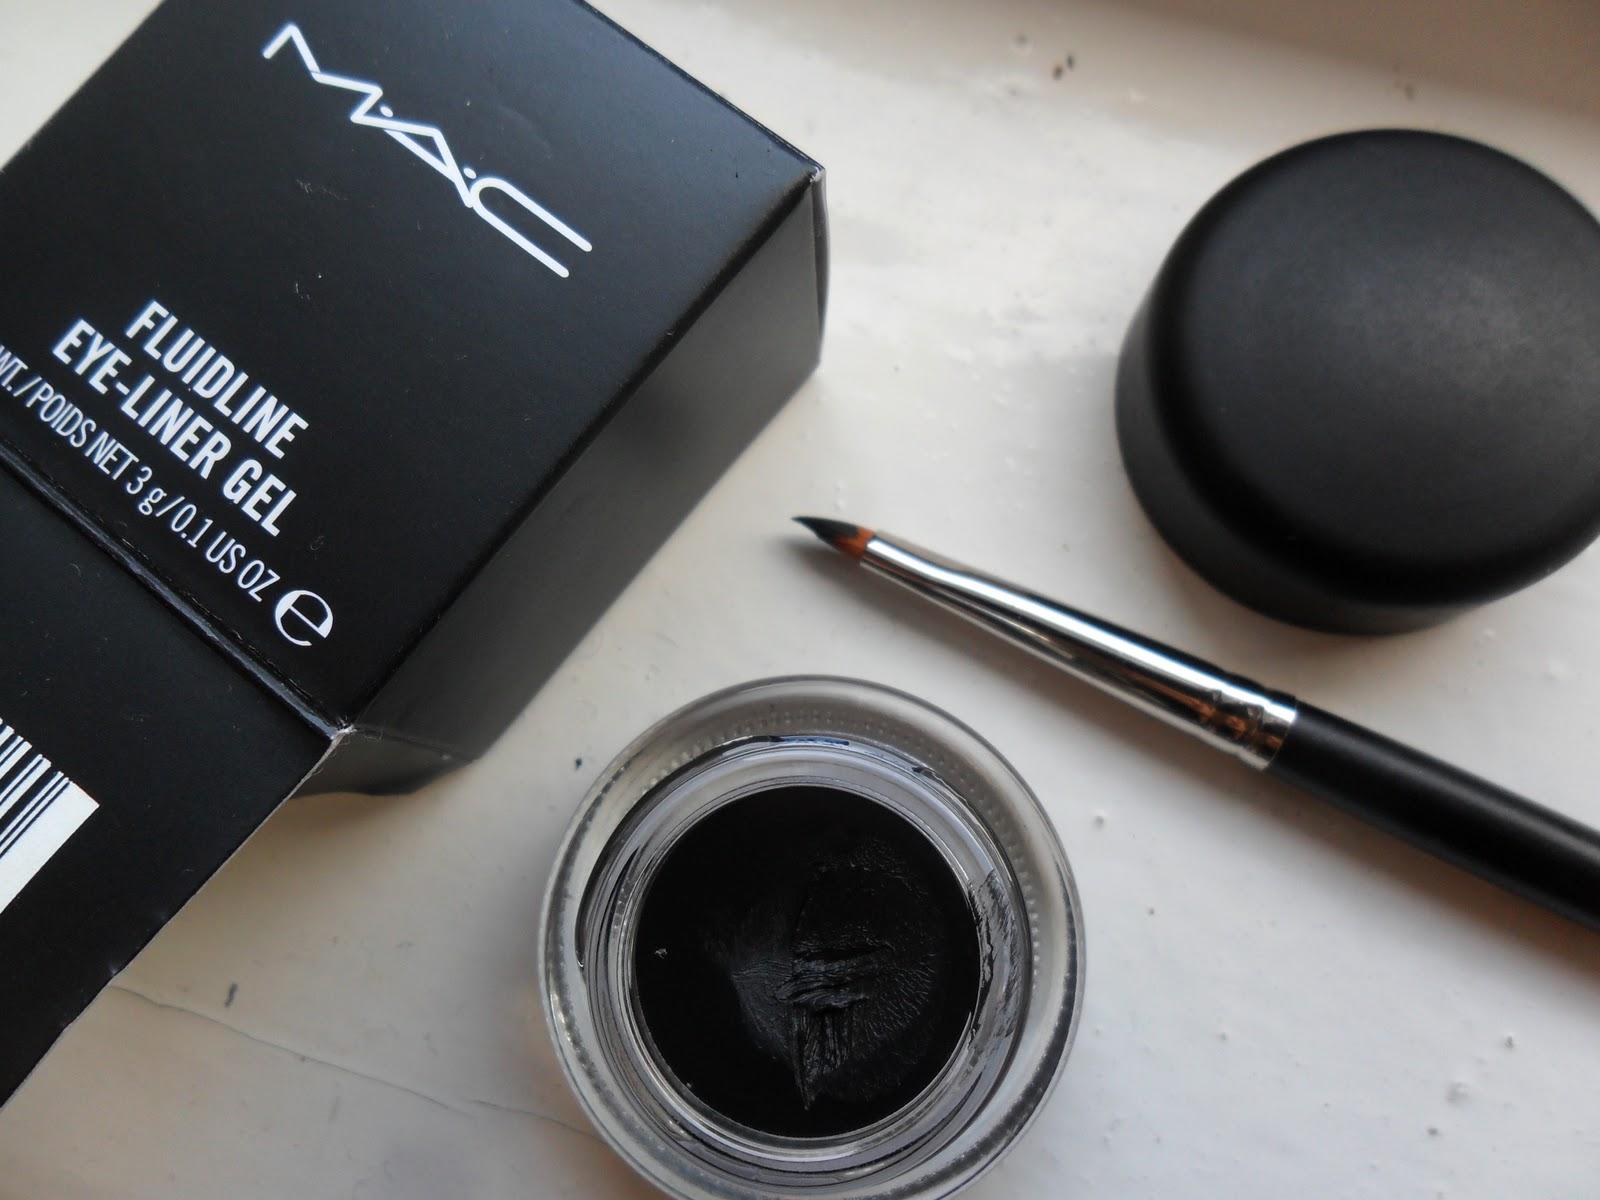 Beauty May Be Mac Fluidline Blacktrack